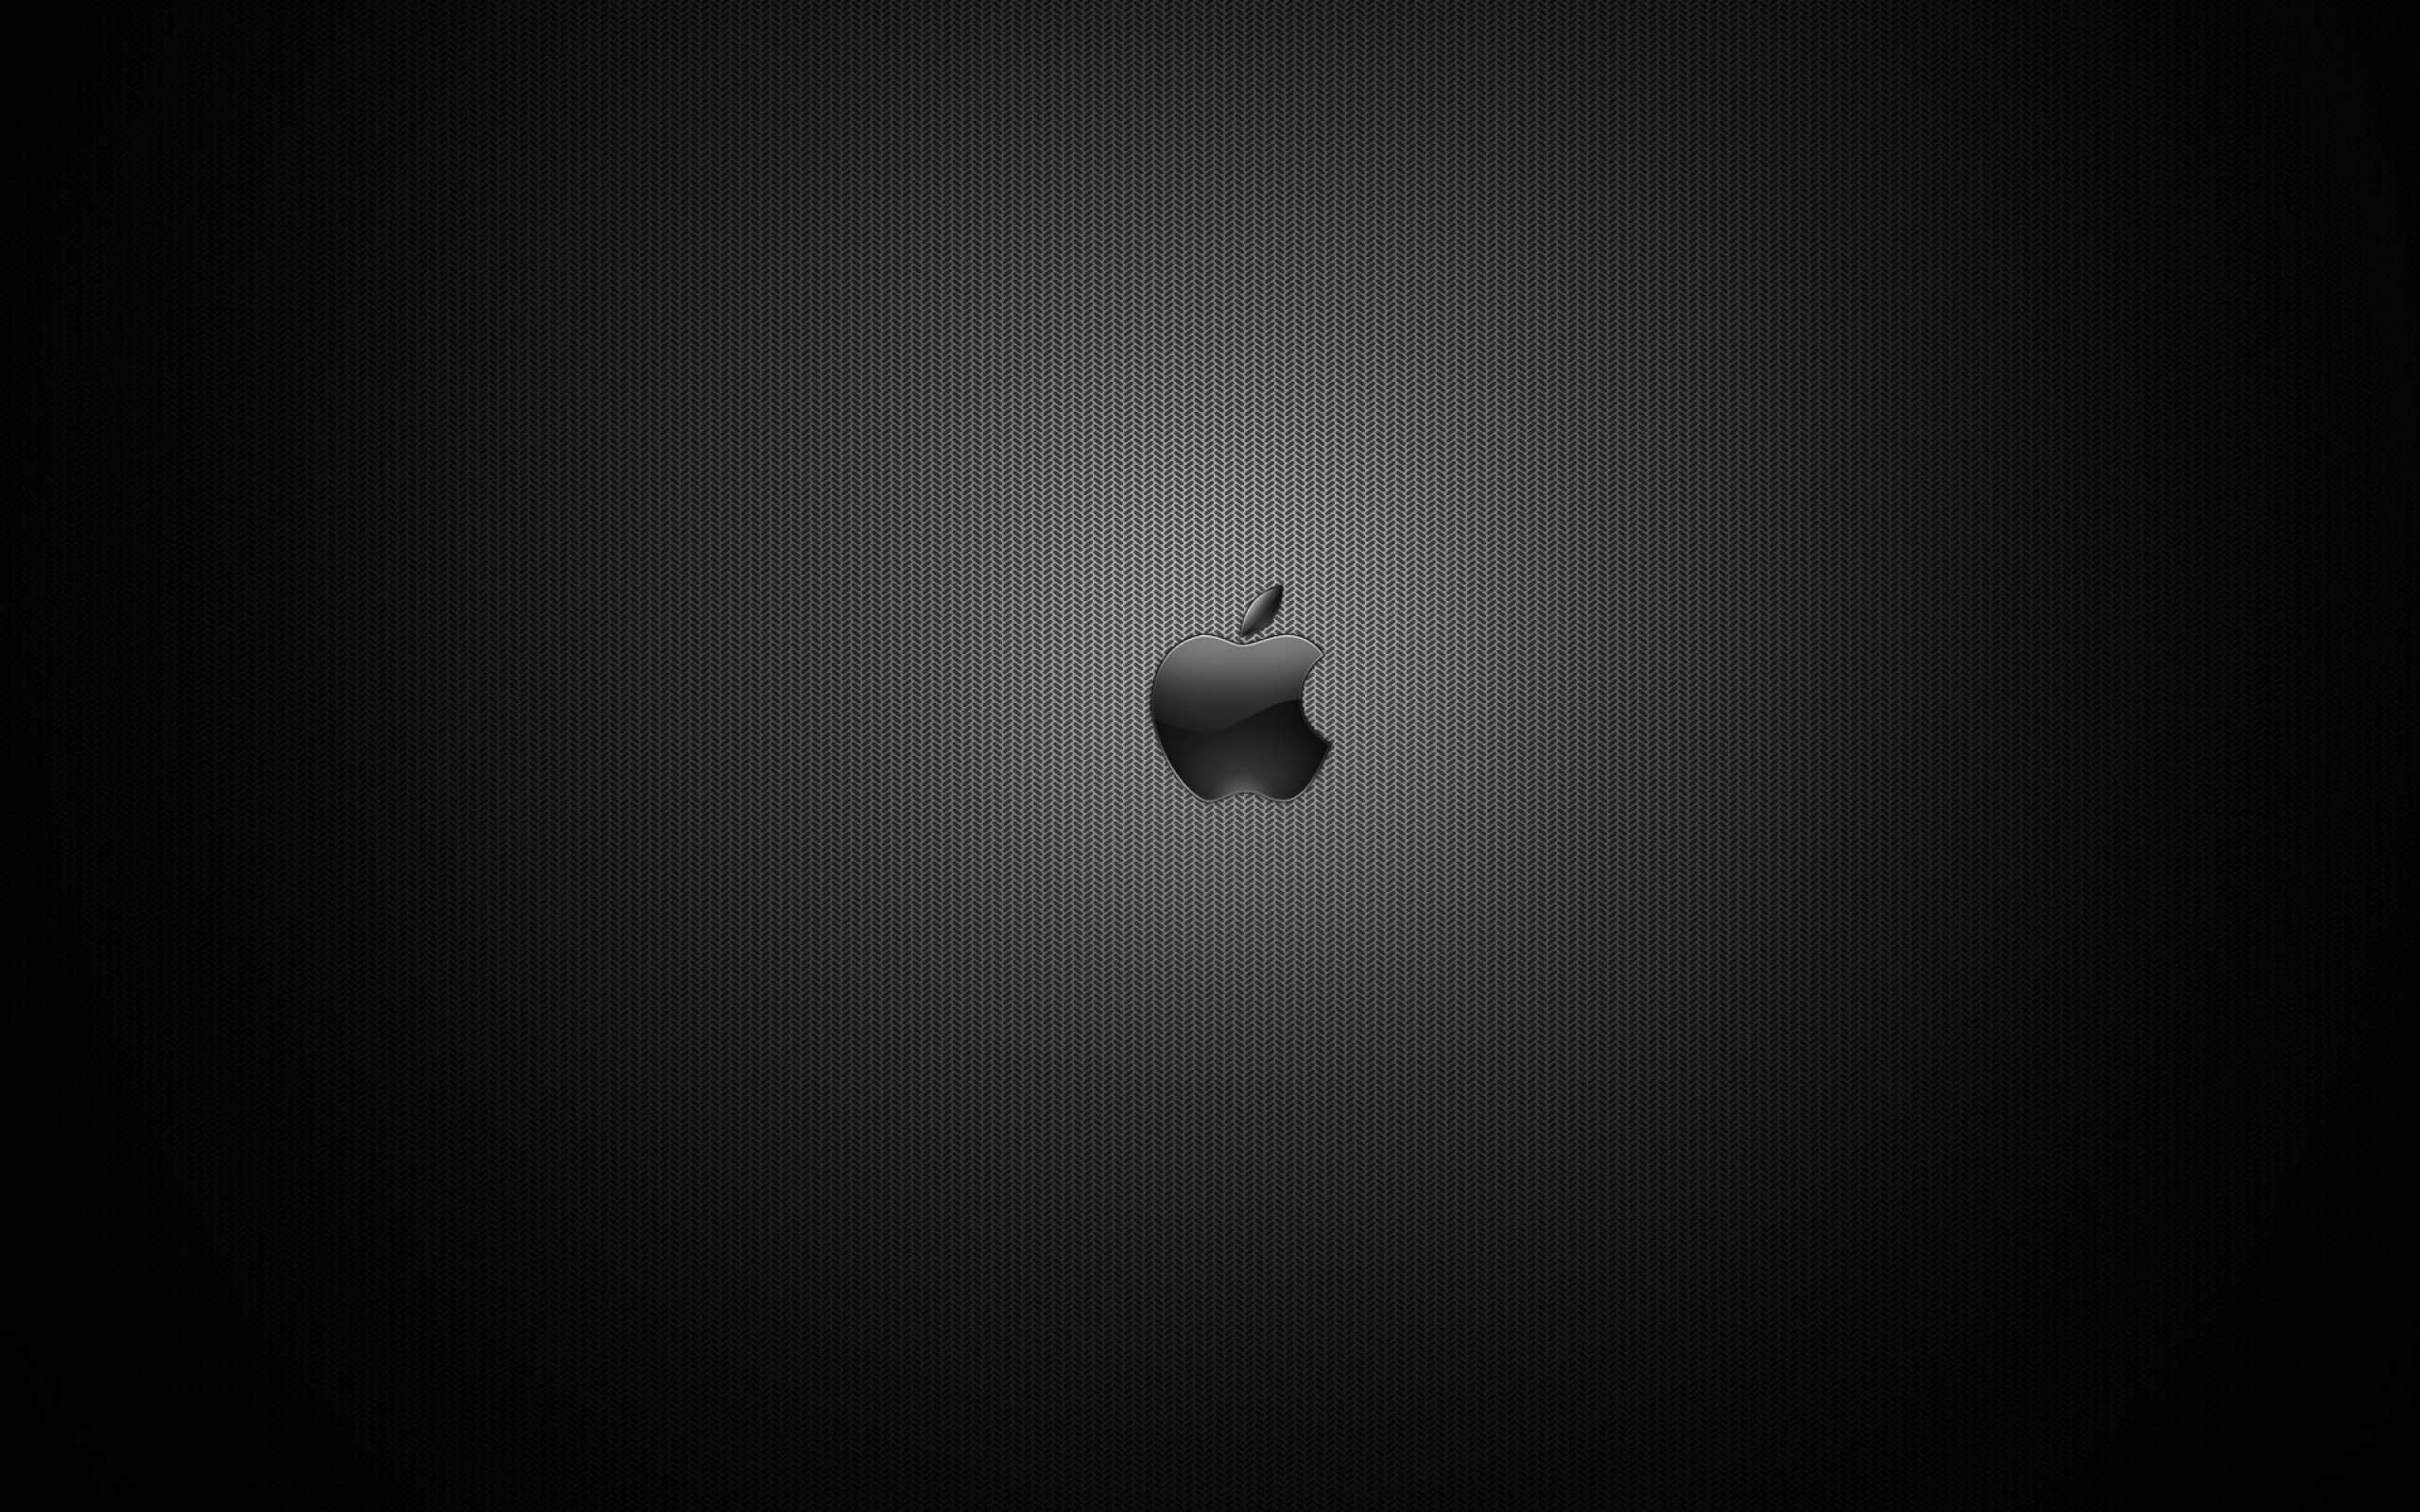 Apple Hd 4k Desktop Wallpapers Wallpaper Cave